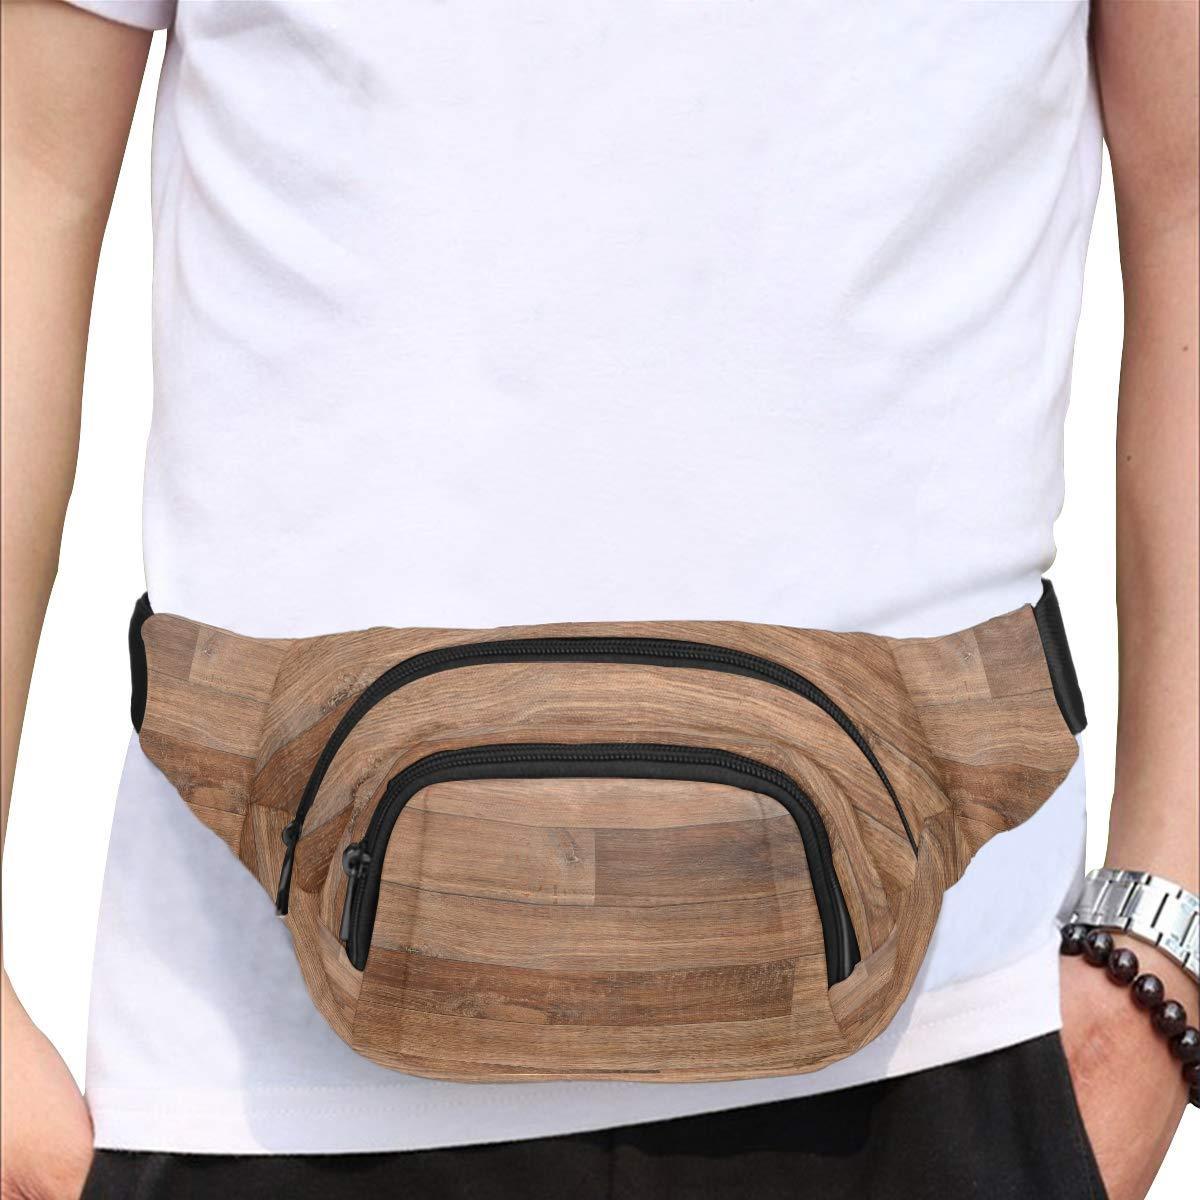 Old Grunge Dark Textured Wooden Fenny Packs Waist Bags Adjustable Belt Waterproof Nylon Travel Running Sport Vacation Party For Men Women Boys Girls Kids